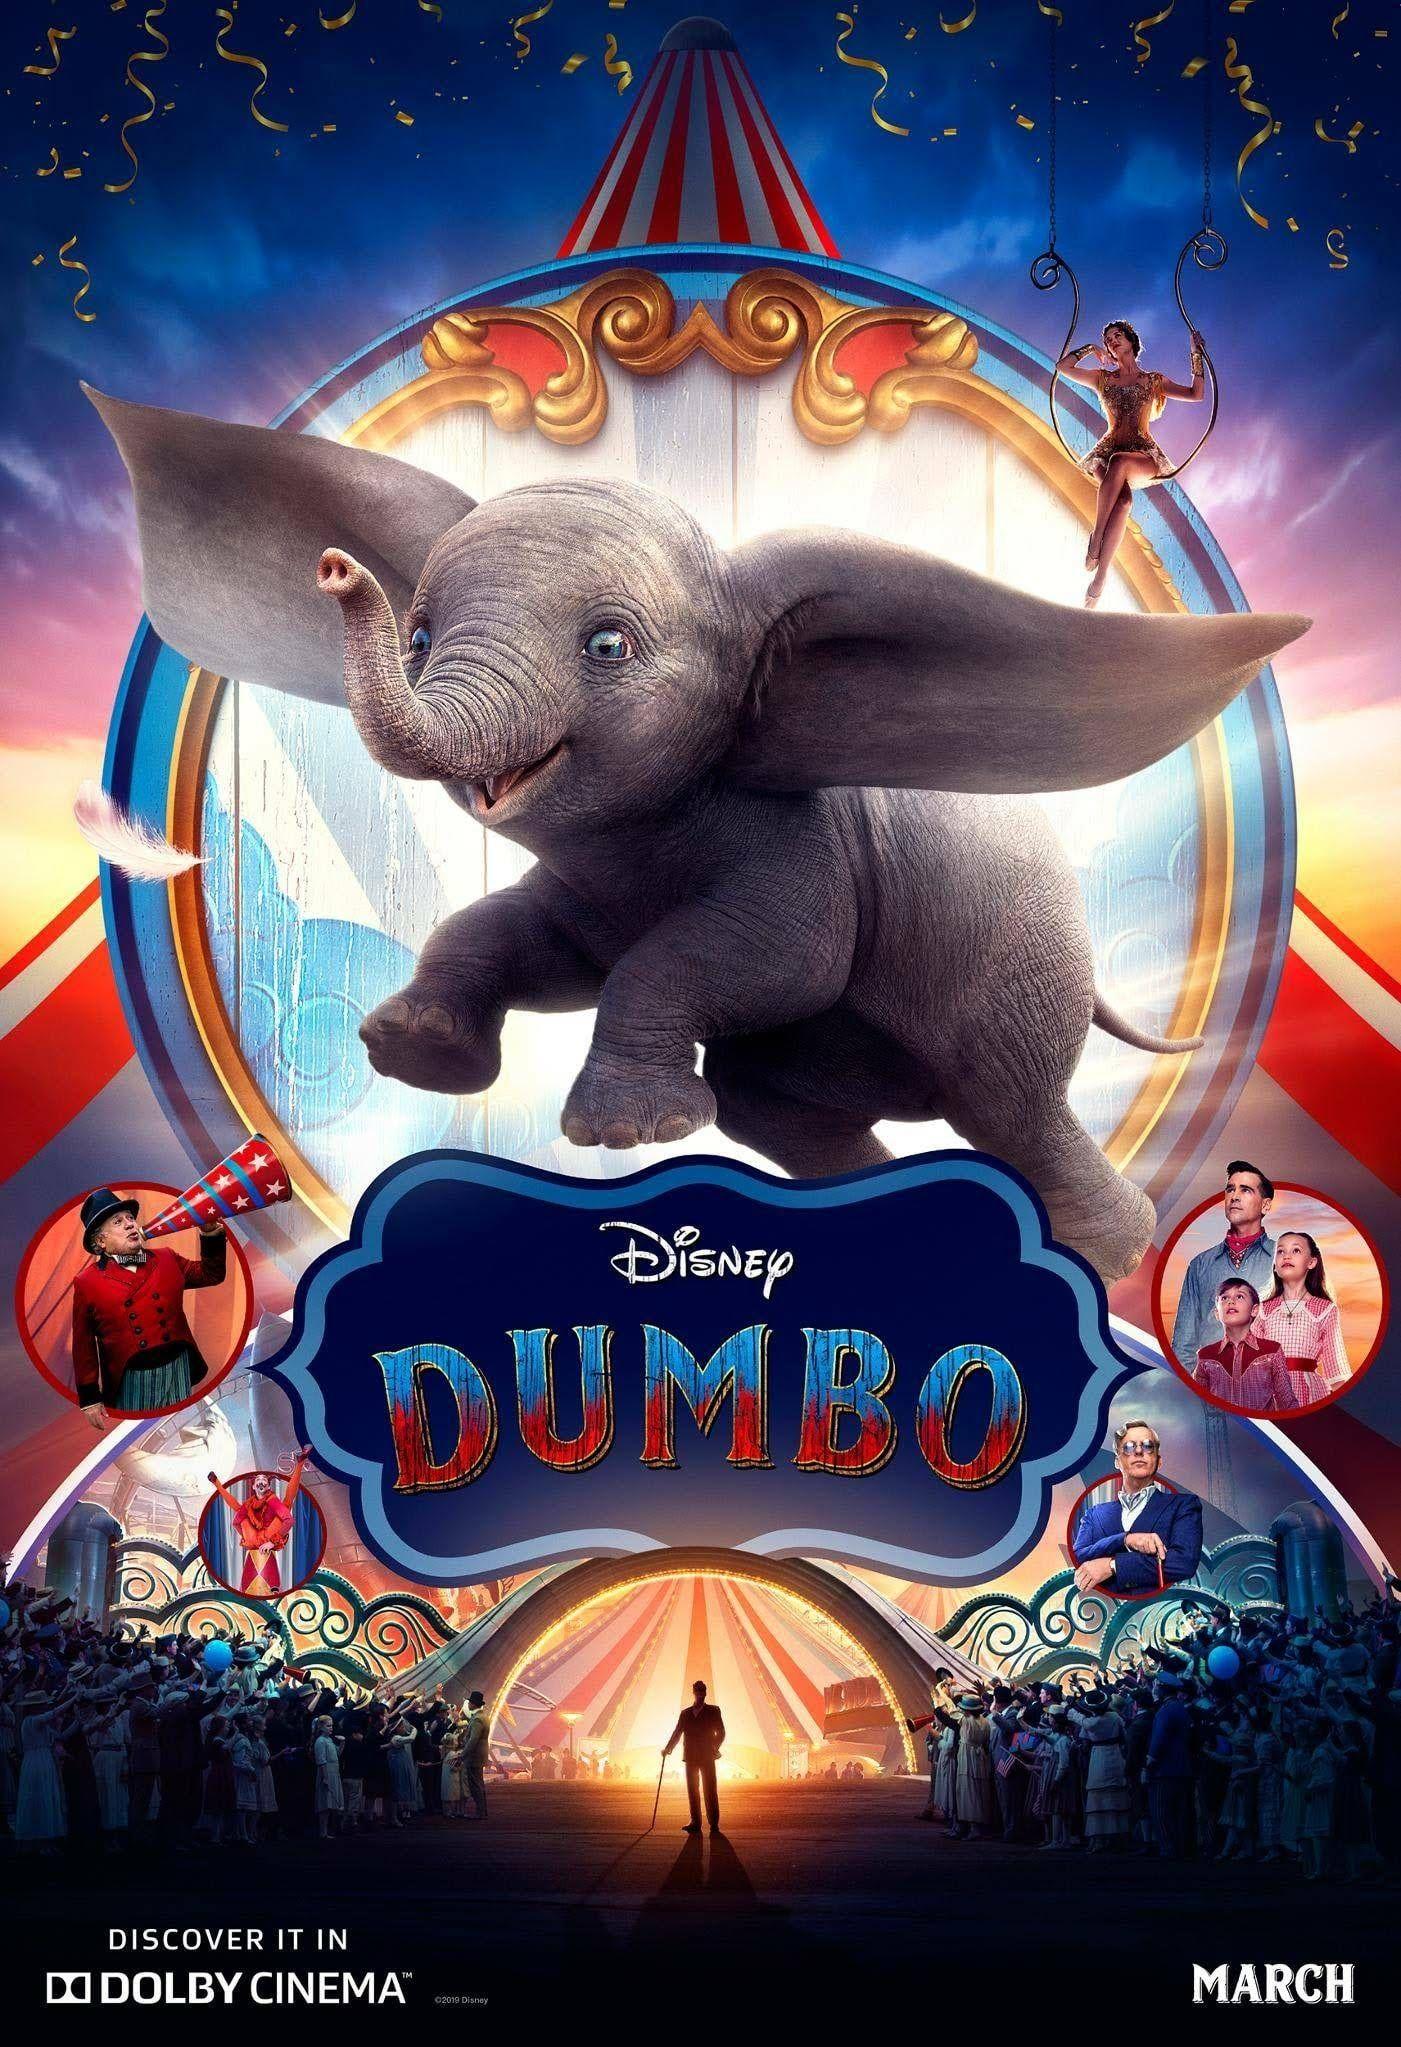 box office 3月29日 31日の全米映画ボックスオフィスtop5の第1位 アリス のティム バートン監督が 空飛ぶ子象の名作アニメを実写化した ダンボ が ディズニーの期待にそって 舞い上がることが出来ず 低空飛行に甘んじたガッカリの初登場第1位 a